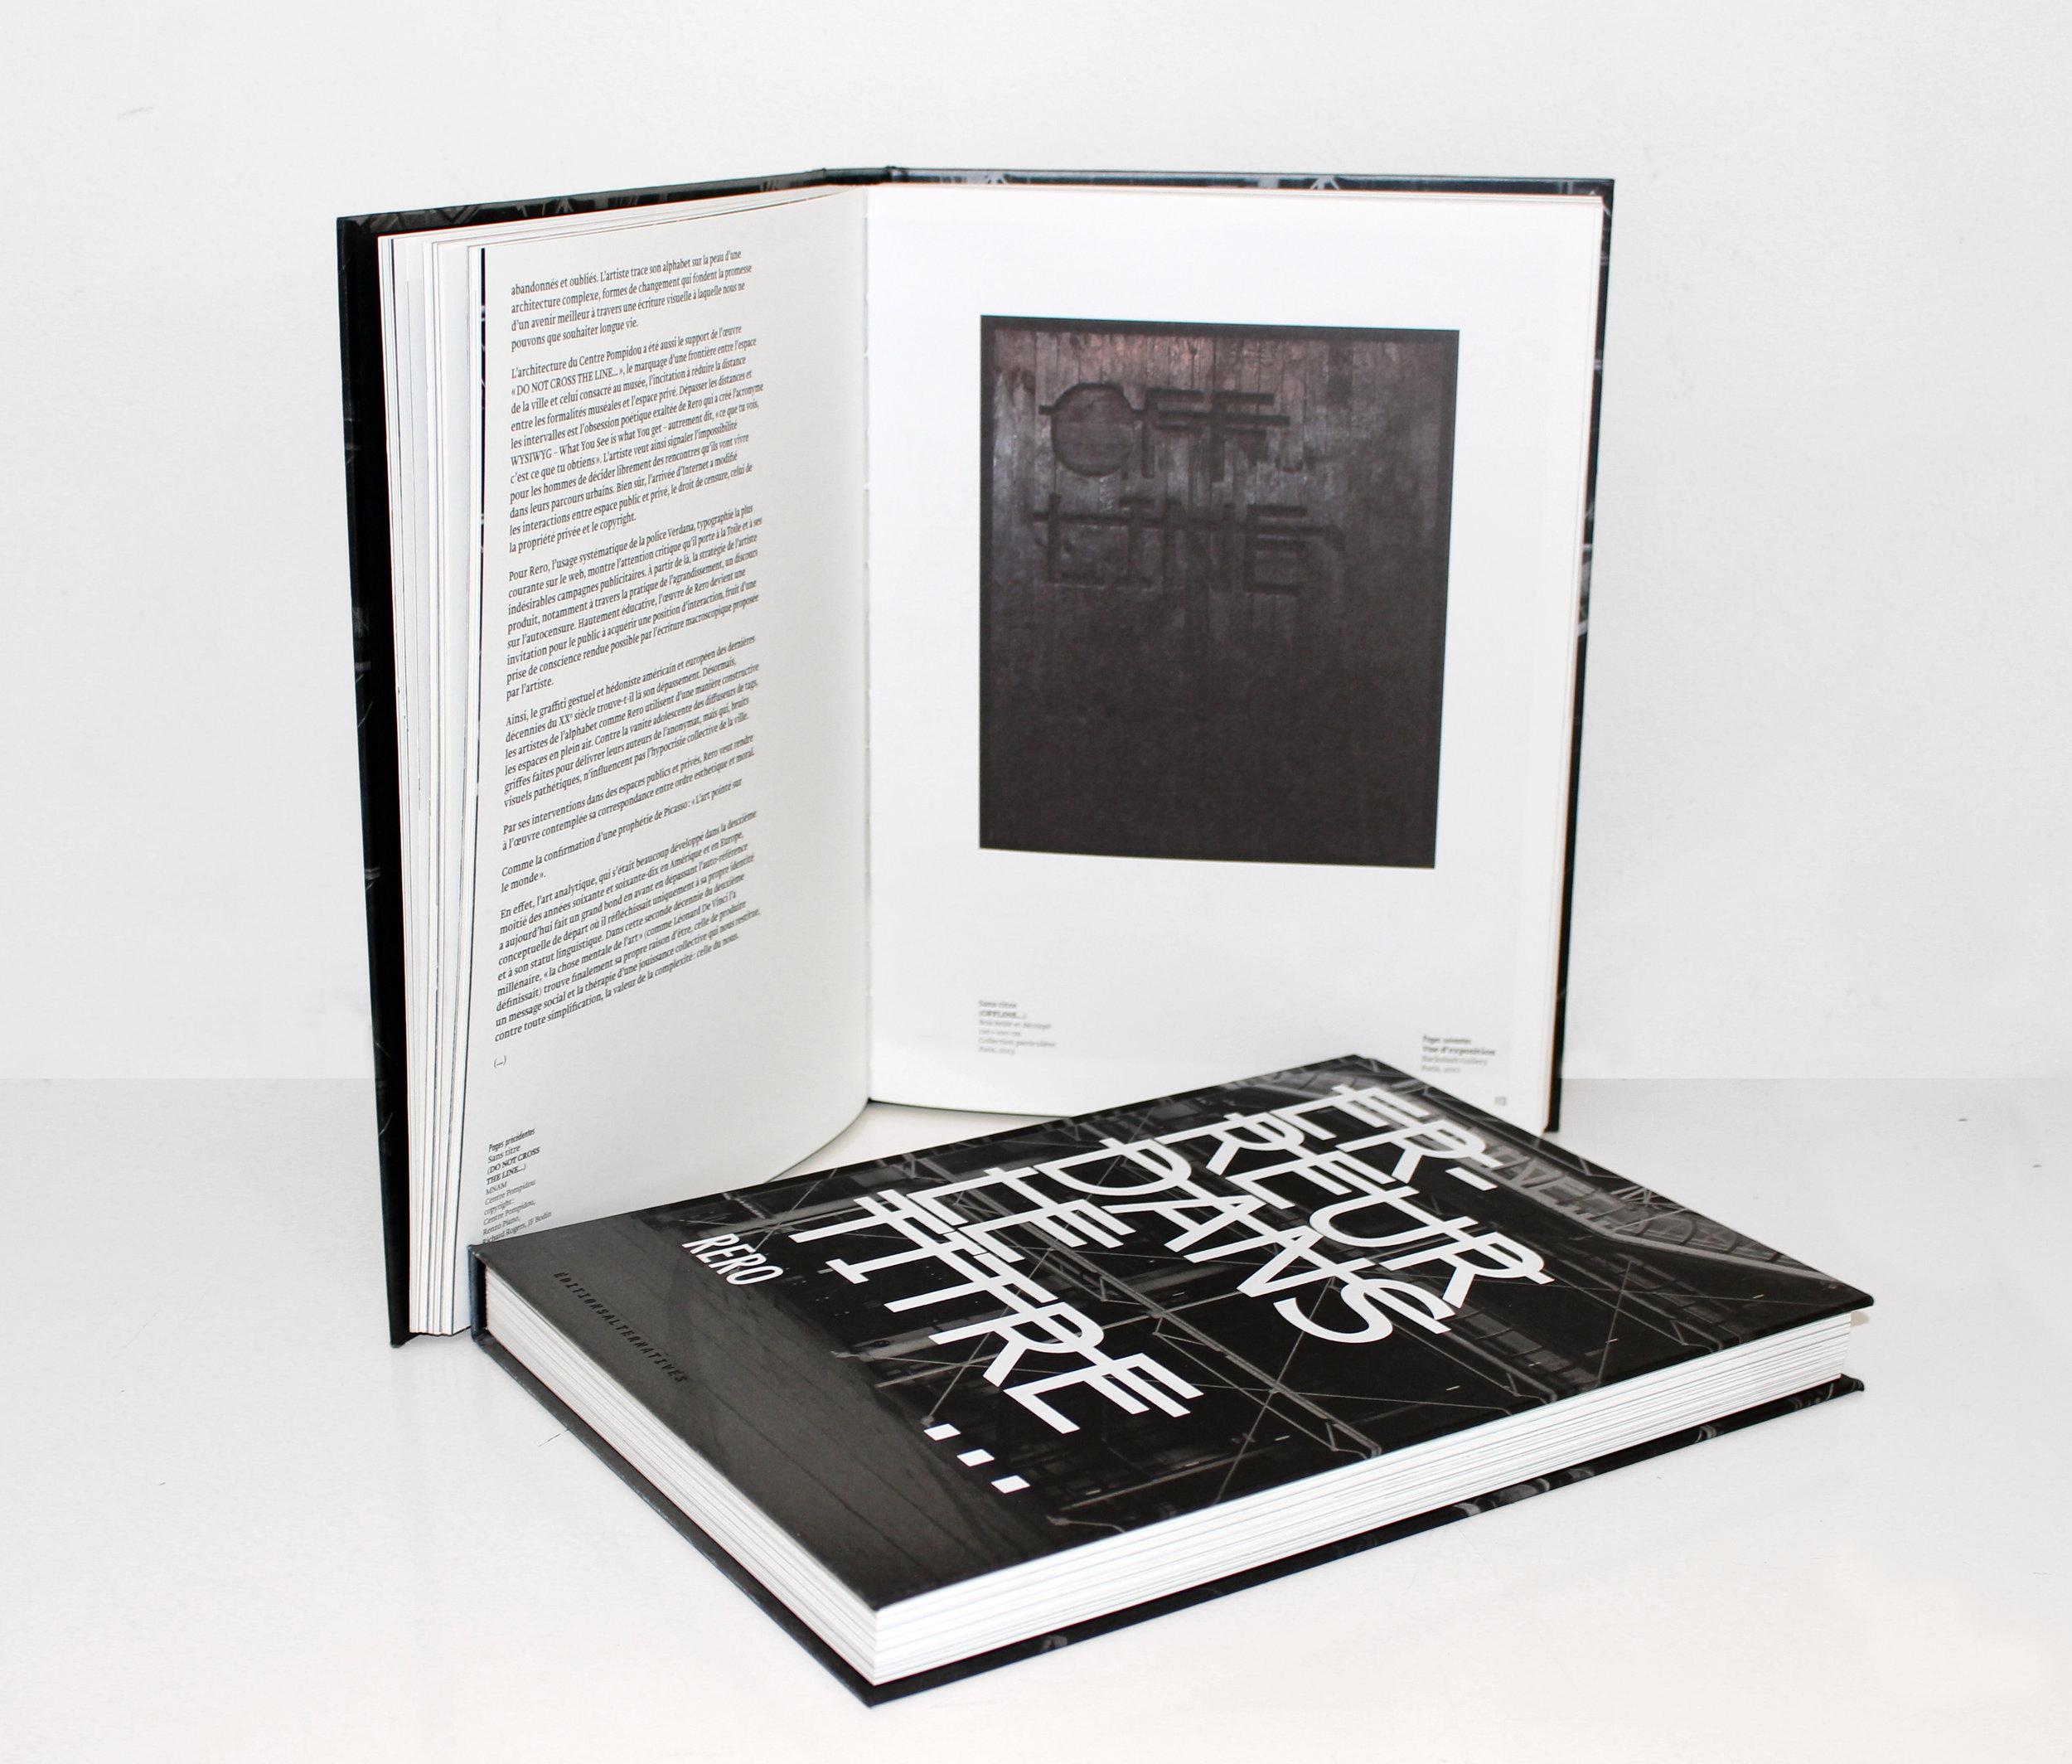 bookstore-erreur-2.jpg